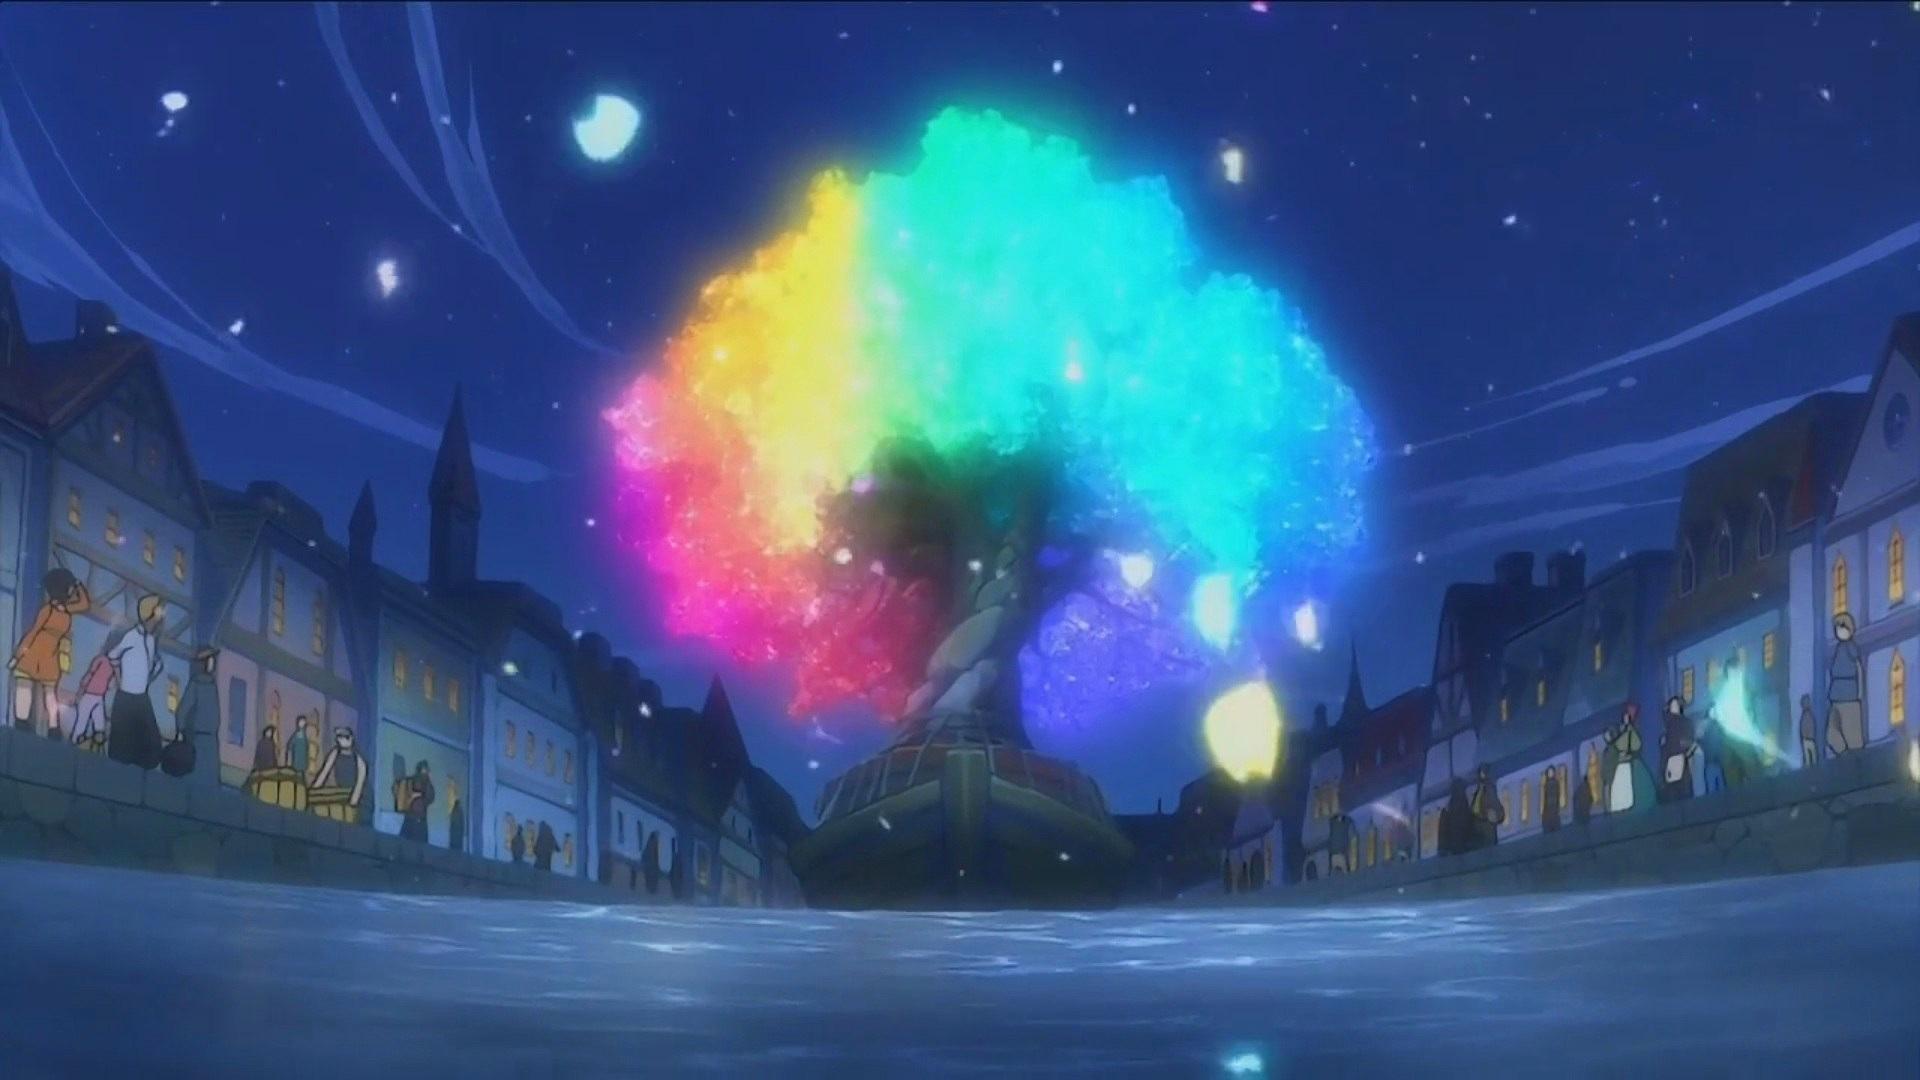 wallpaper.wiki-HD-Anime-Cherry-Blossom-Wallpaper-PIC-